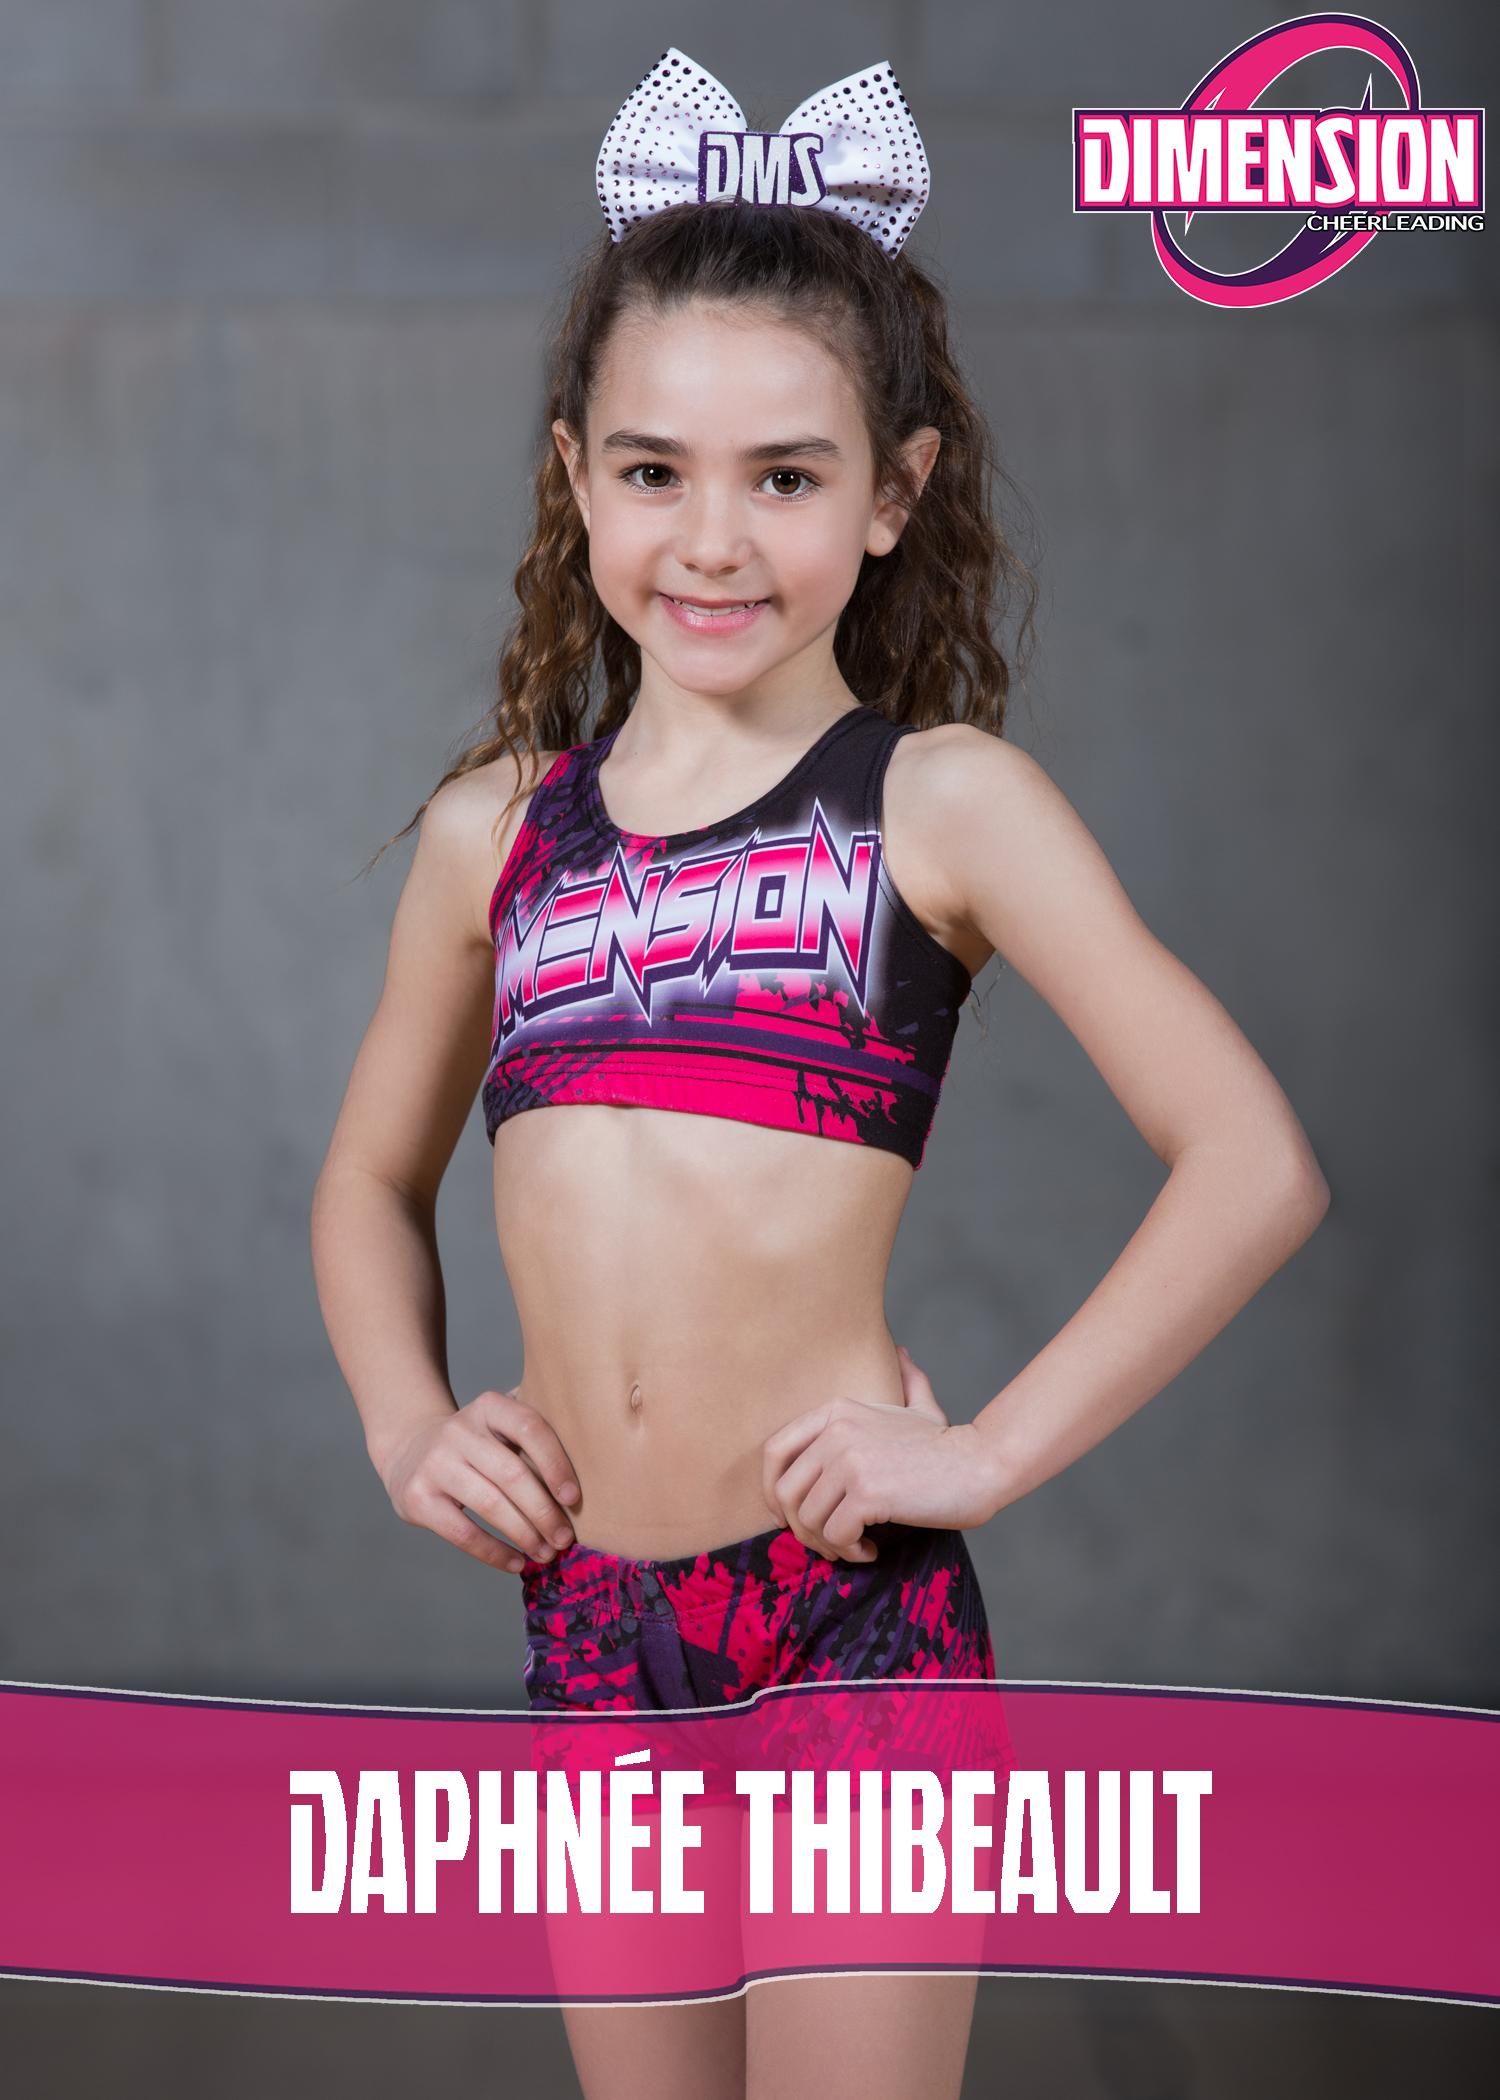 Daphnée_Thibeault